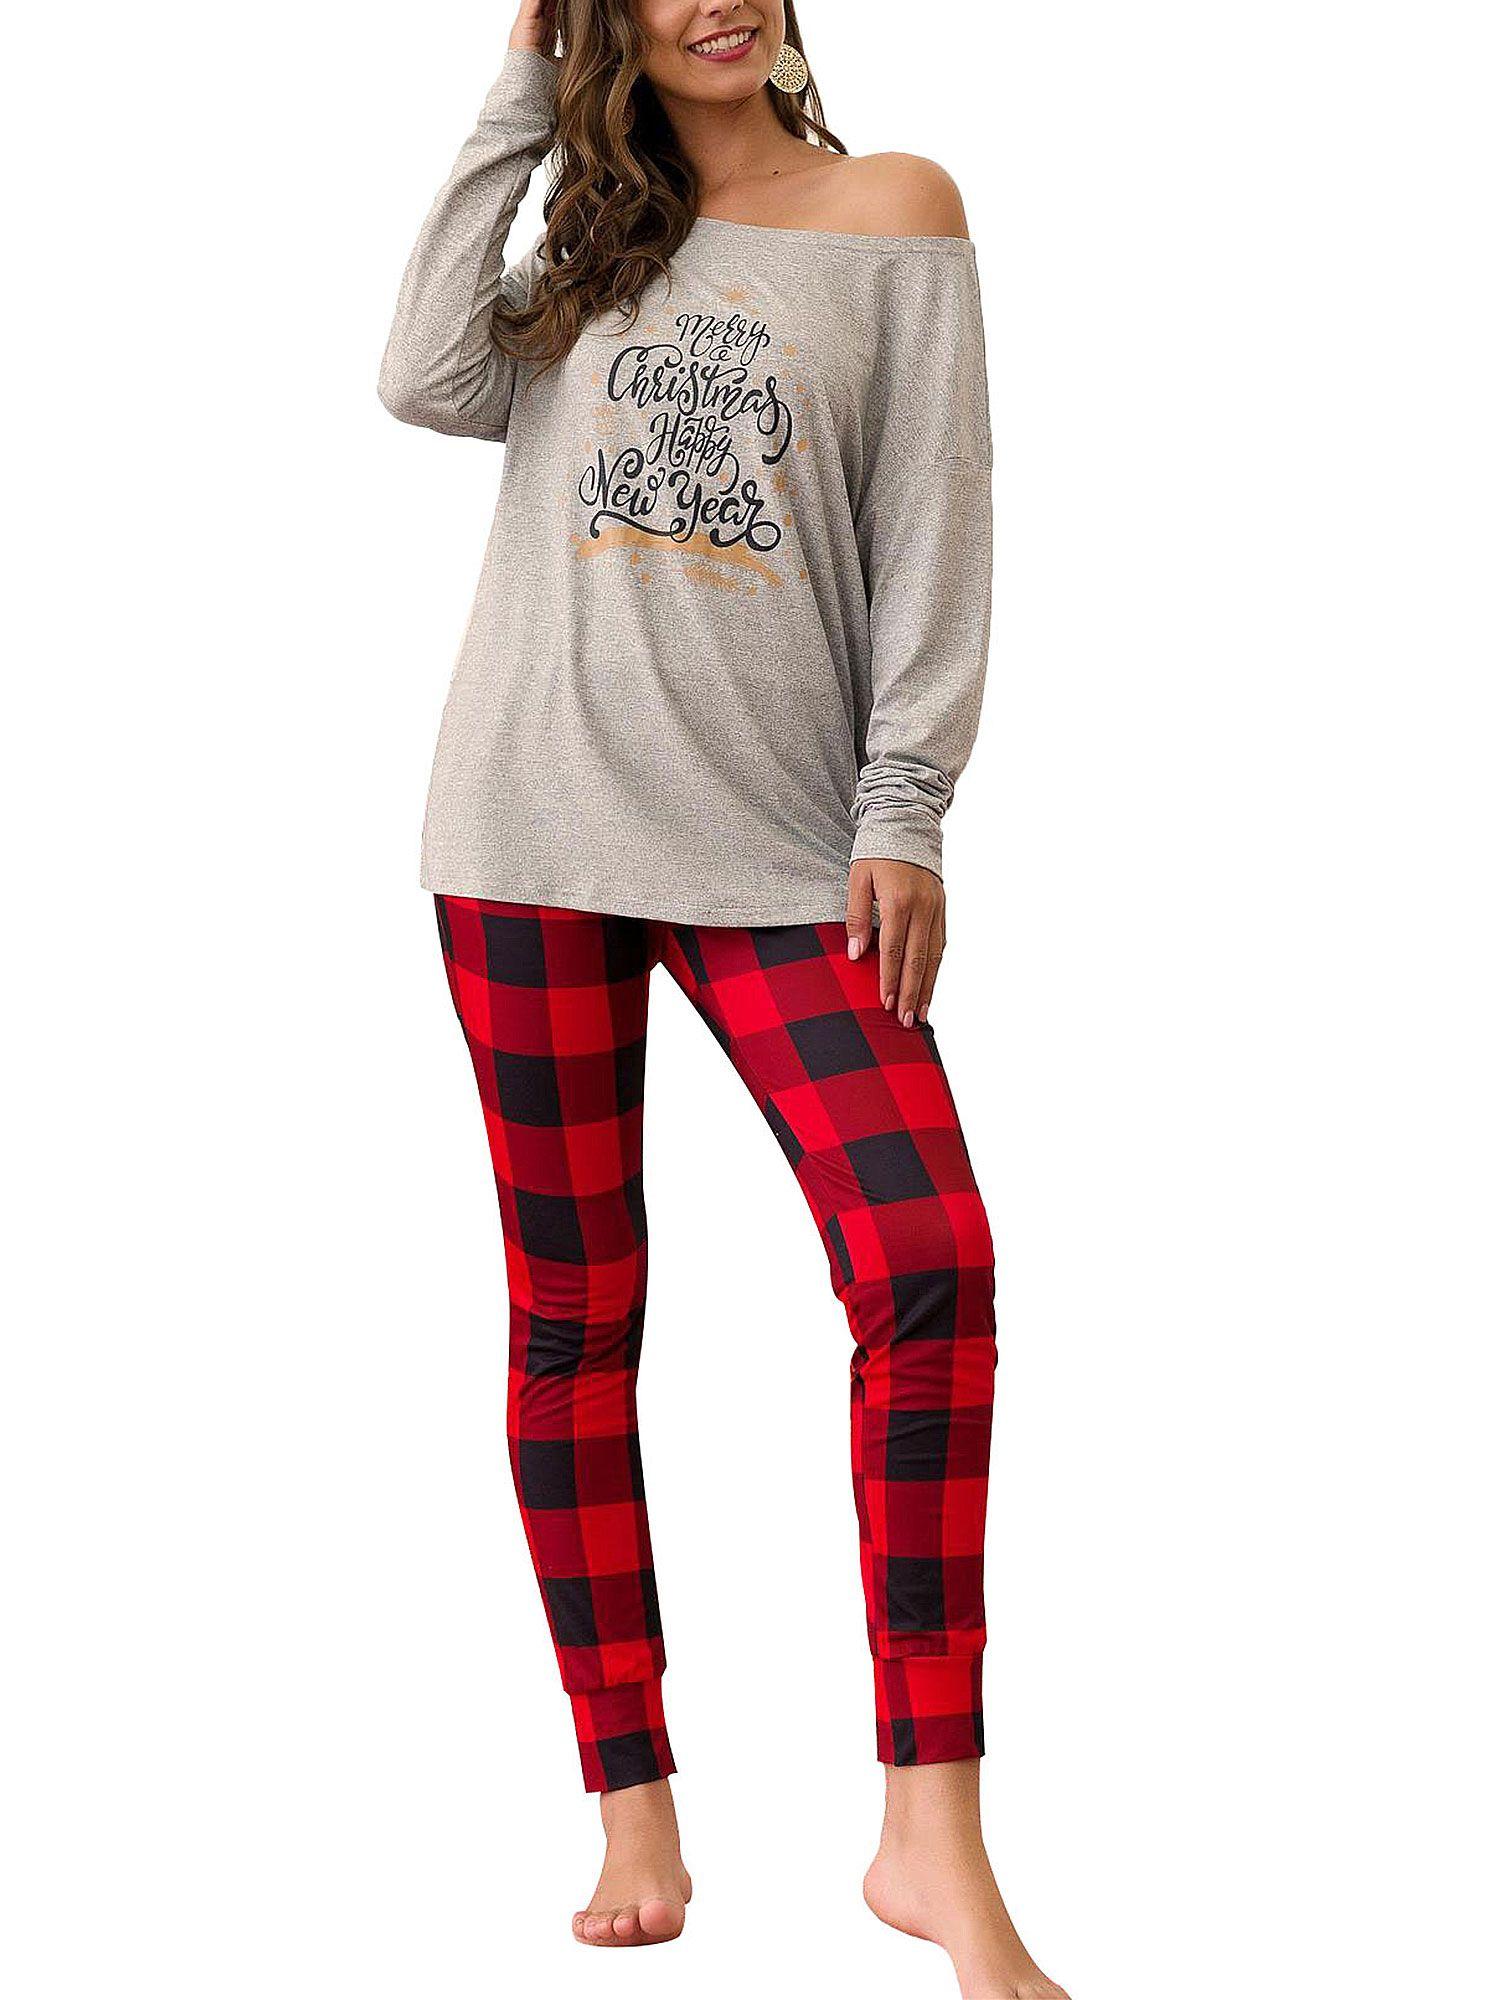 Plus Size Family Women Girls One Shoulder Christmas Pyjamas Xmas 2pcs Nightwear Pajamas Pjs Set Ladies Long Sleeve Shirt Classic Plaid Checked Pants Savingf Womens Christmas Pajamas Christmas Pajamas